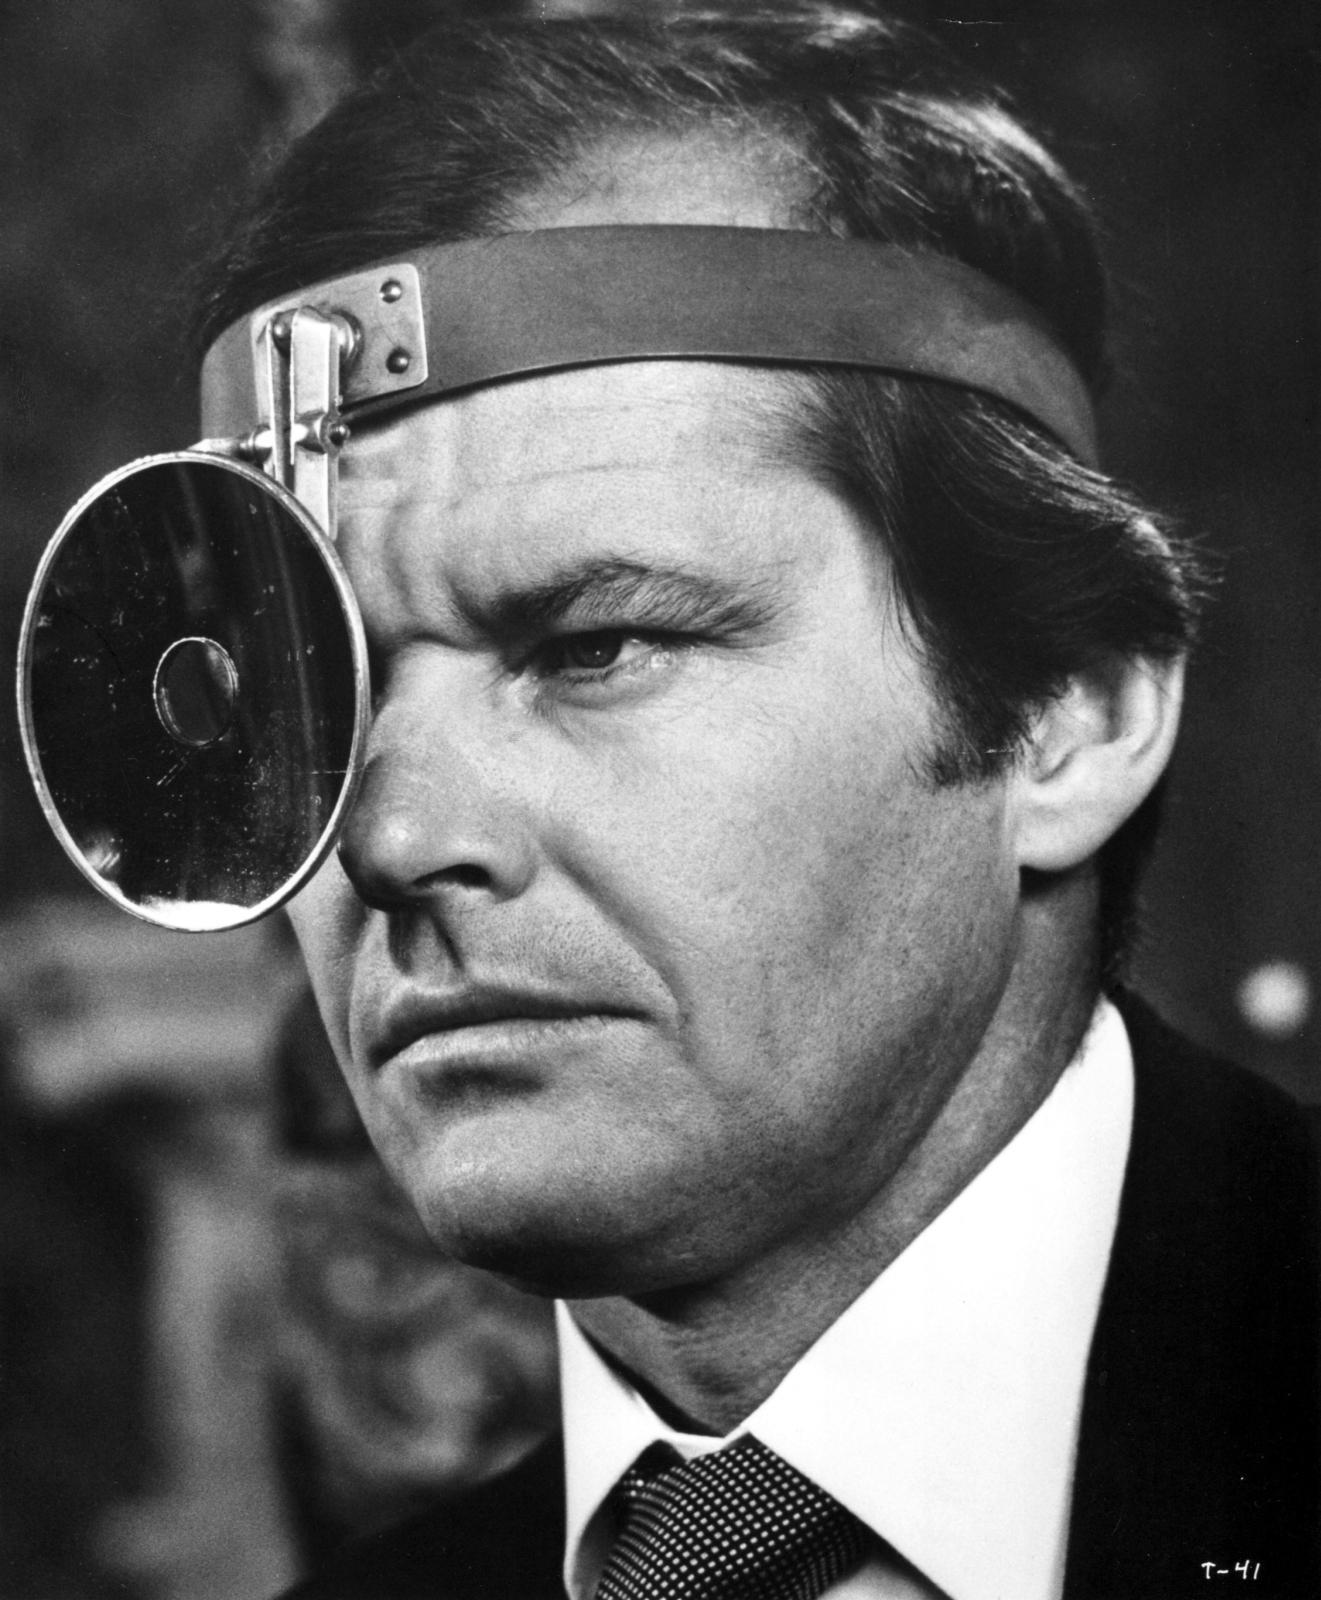 Young Jack Nicholson Sunglasses